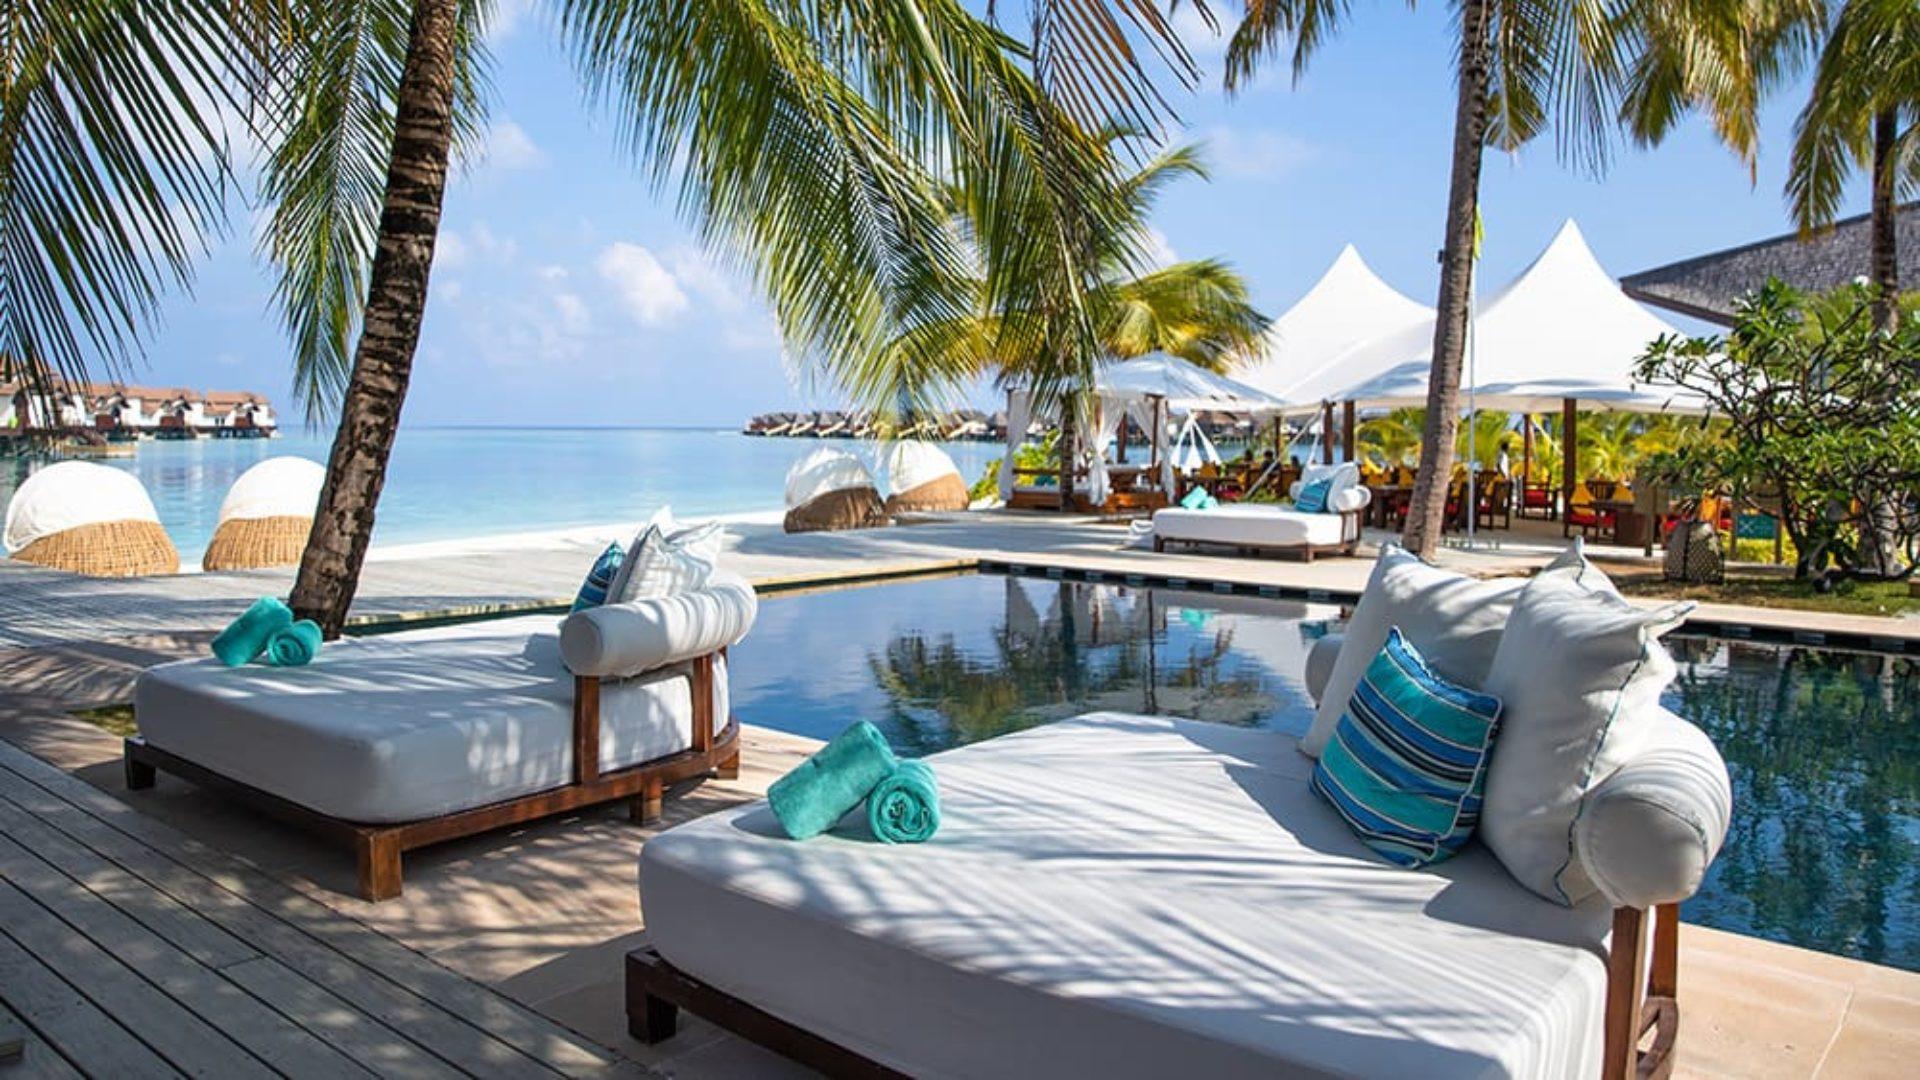 Pool loungers under palm trees at Jumeirah Vittaveli